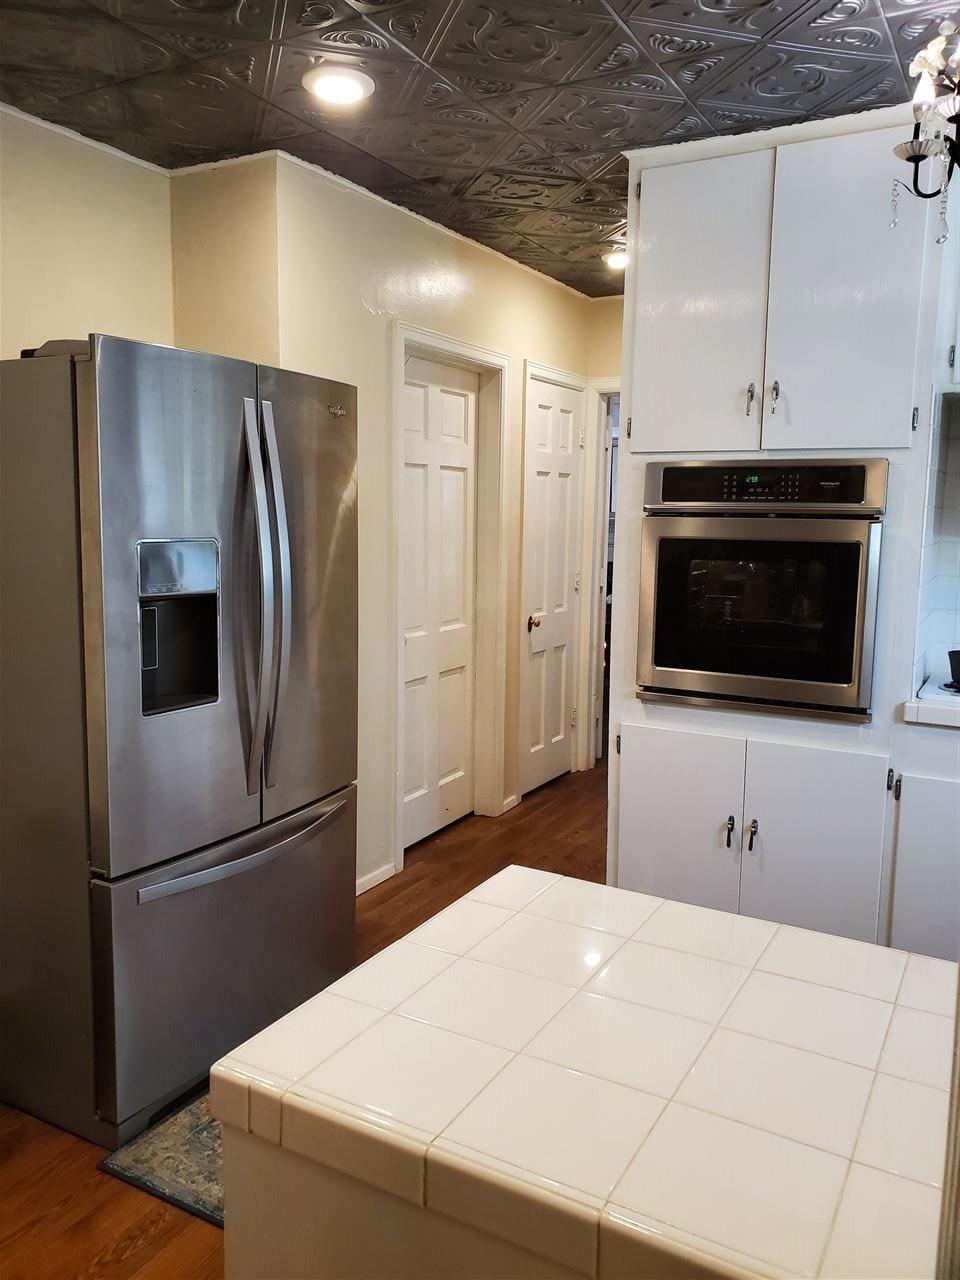 #century21groupone,#homesforsaleponcacity,#poncacityrealestate | 1106 S 7th Street  Ponca City, OK 74601-0 14